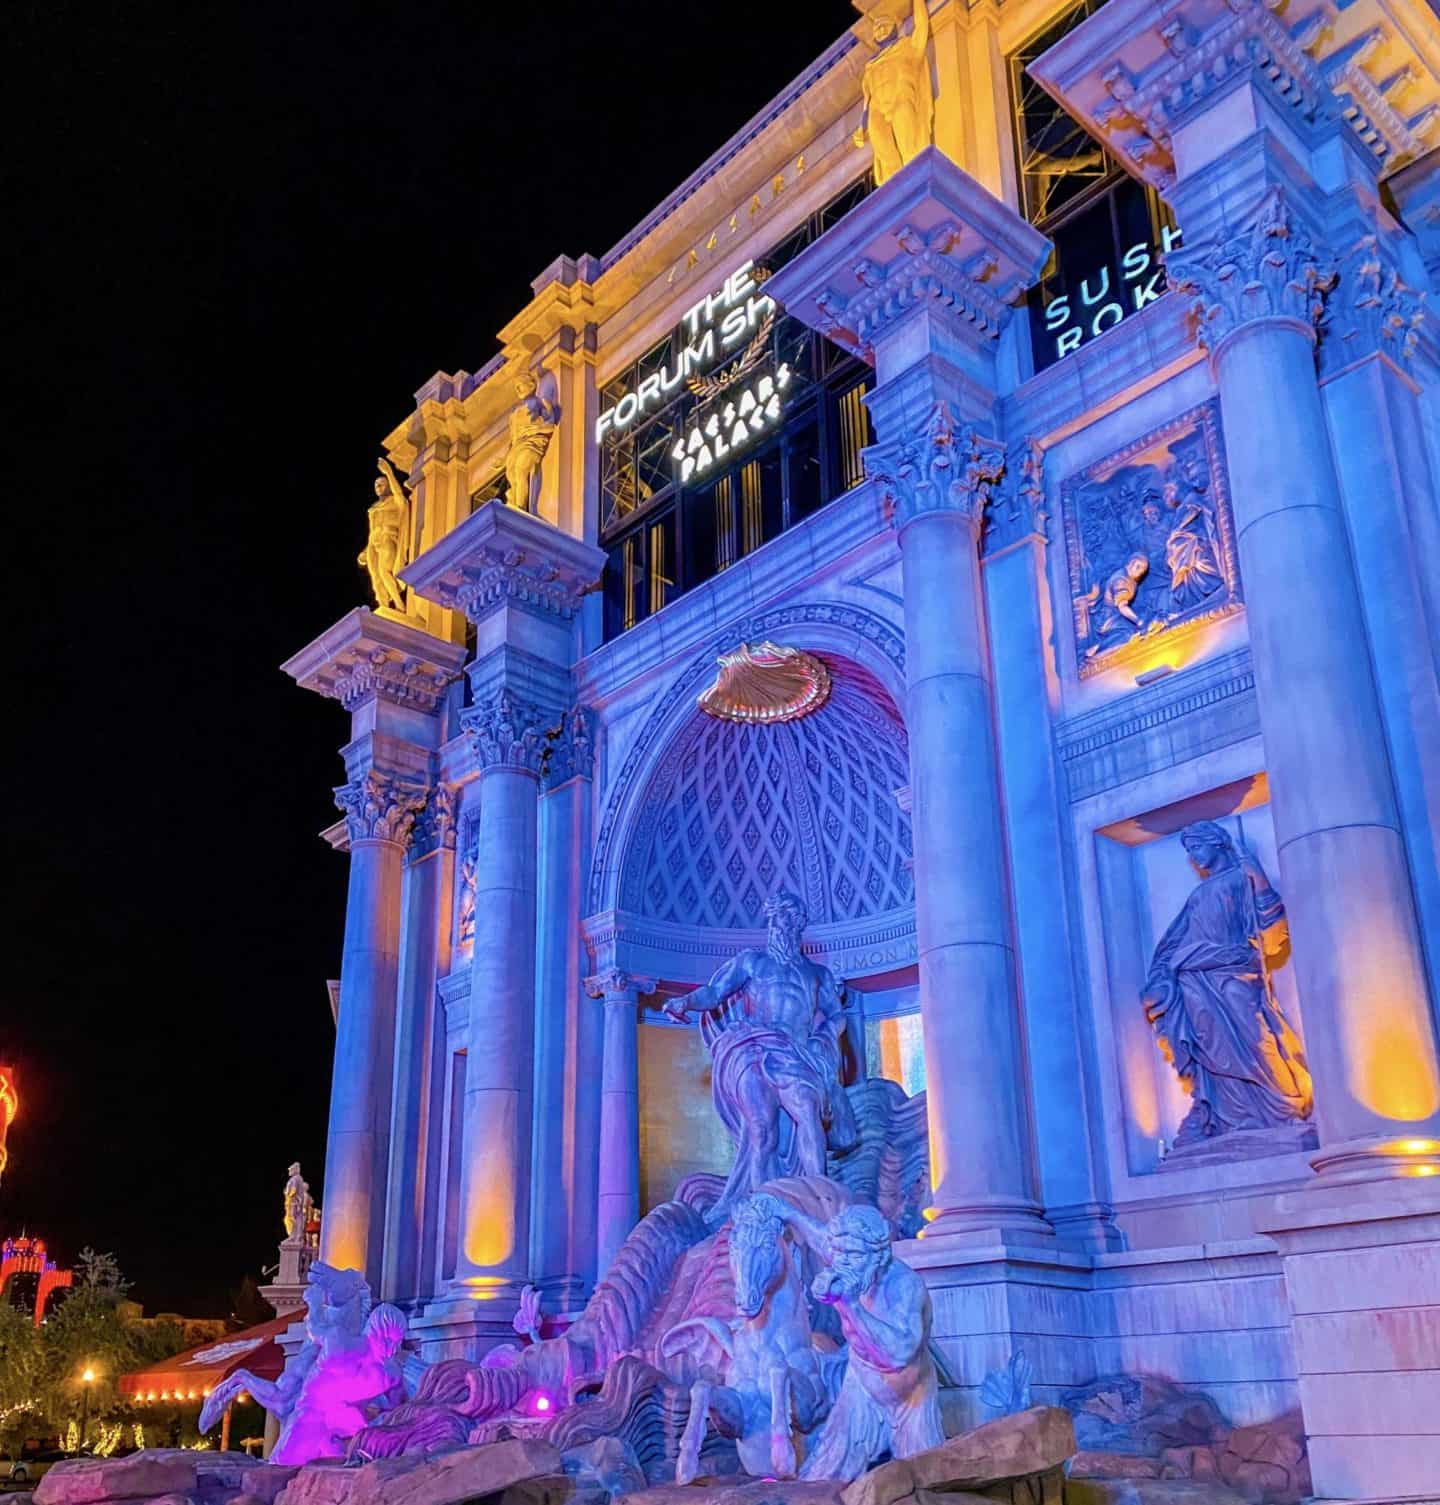 Visit The Forum Shops At Caesars Palace